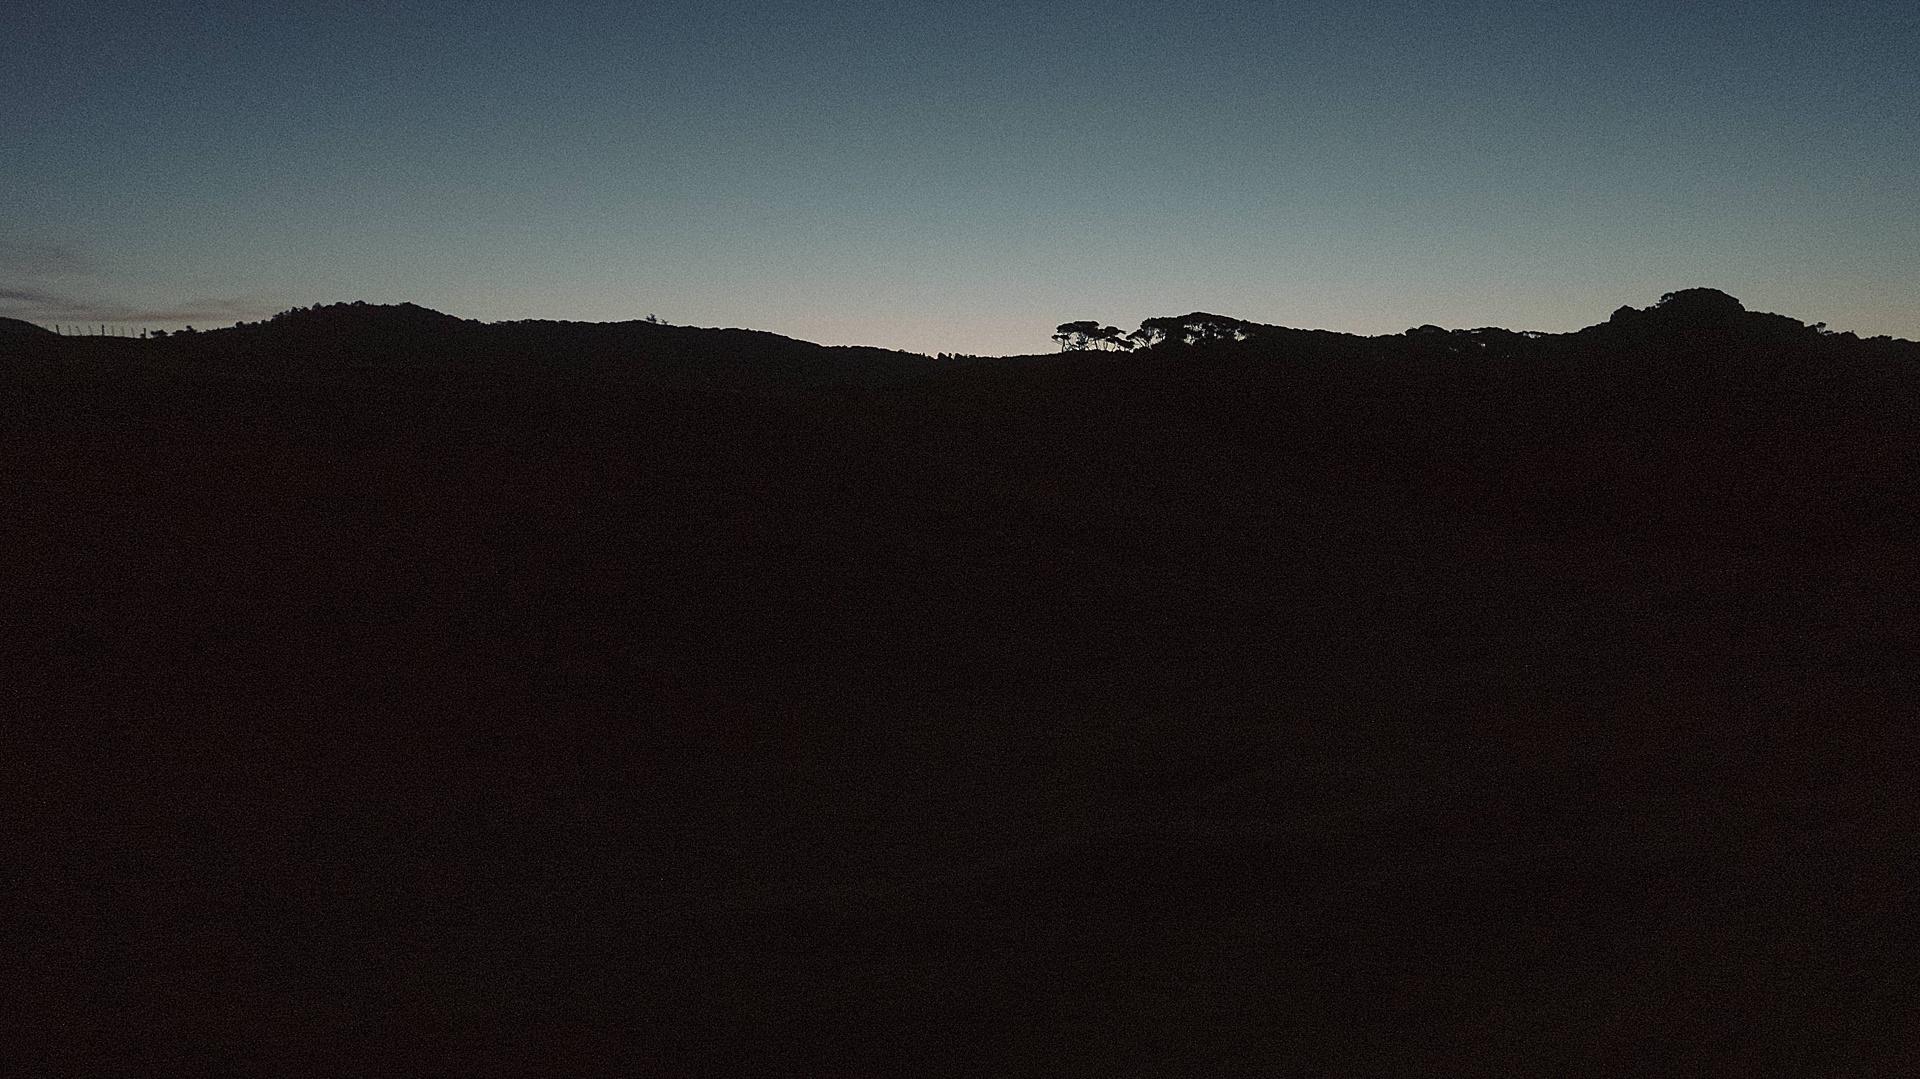 family-roadtrip-neuseeland-travelnewzealand-danielzube_0580.jpg